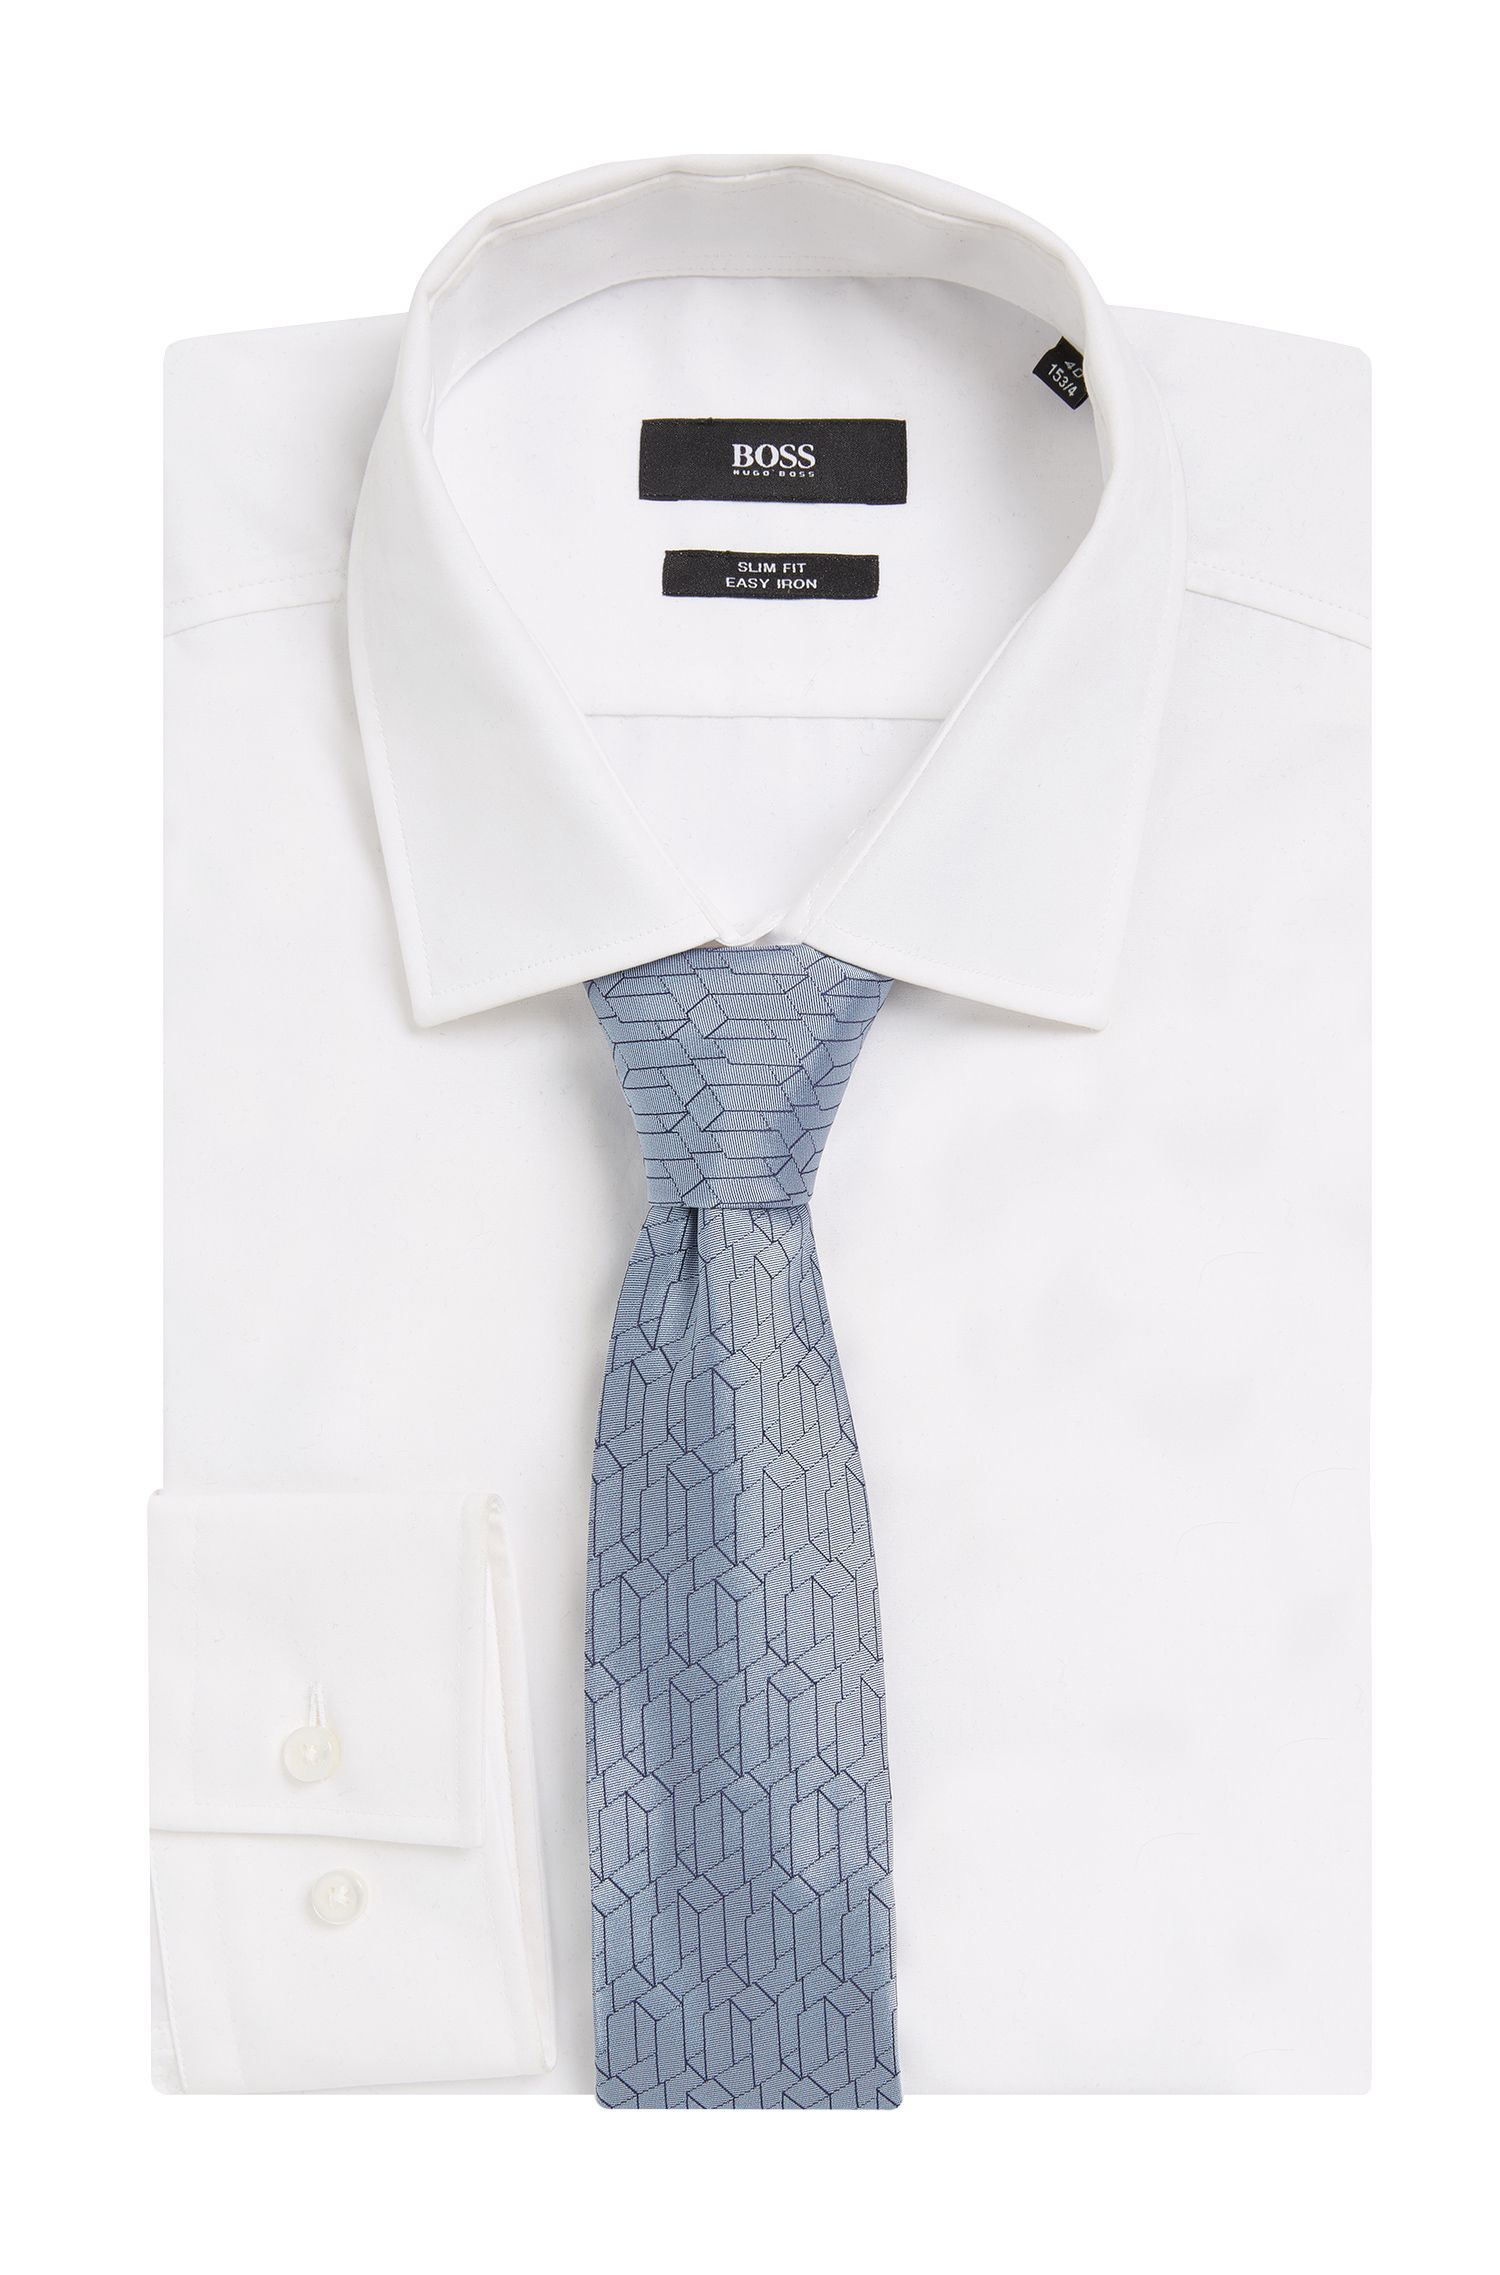 BOSS Tailored Italian Silk Slim Tie, Light Blue